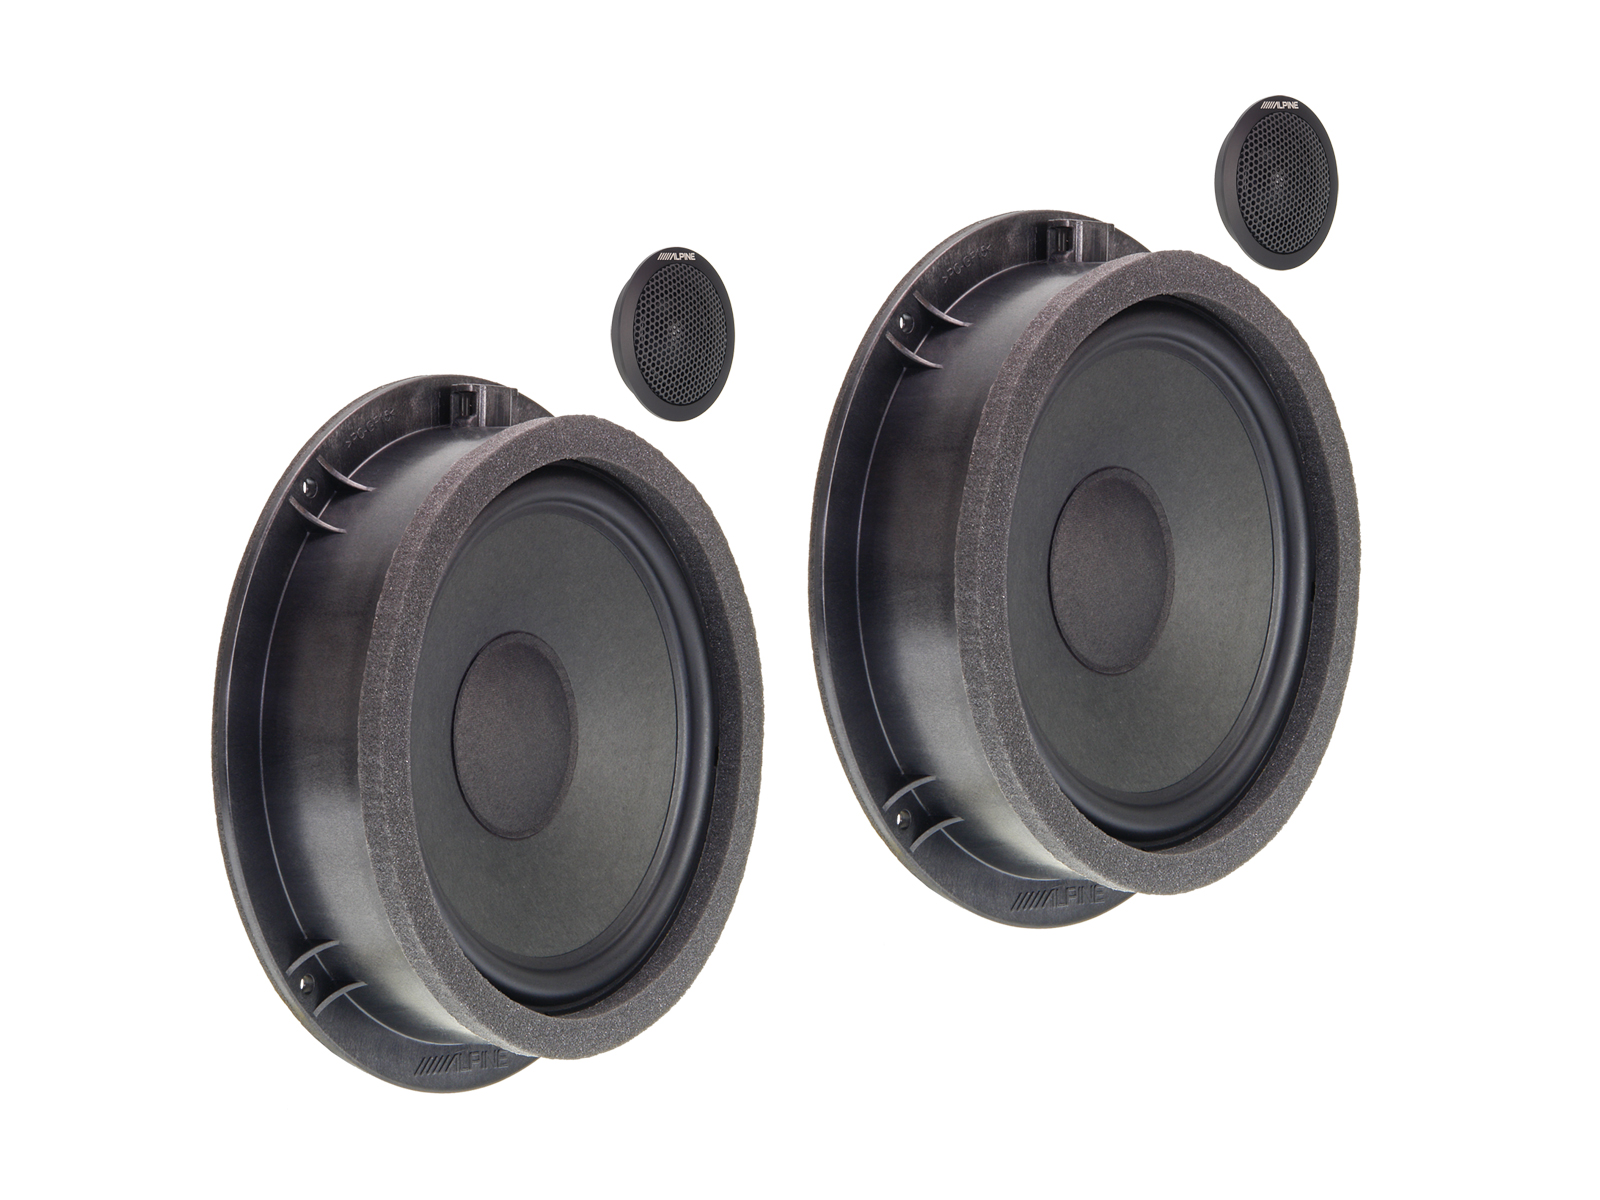 Alpine SPC-100AU Sound-Upgrade Lautsprecher für Audi A4, A5, Q5, S4, RS4, S5, RS5, SQ5